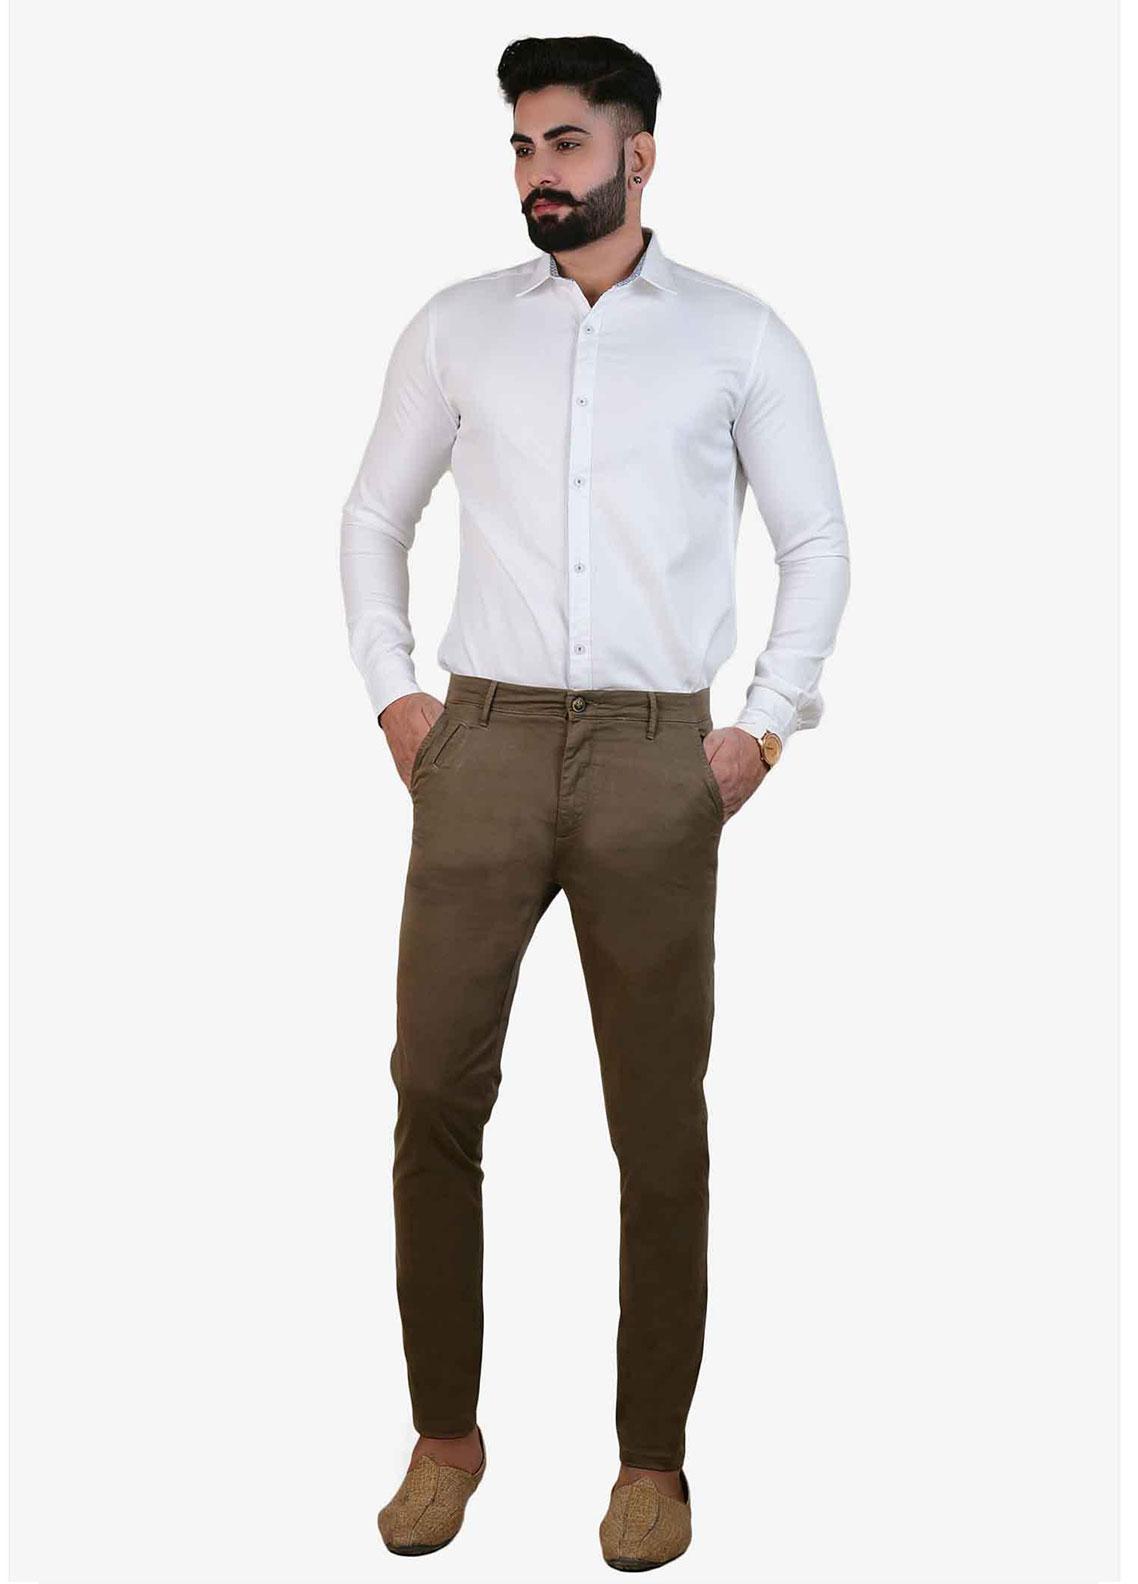 Ignite Wardrobe Cotton Stretchable Chino Men Pants -  IG20PNM 030